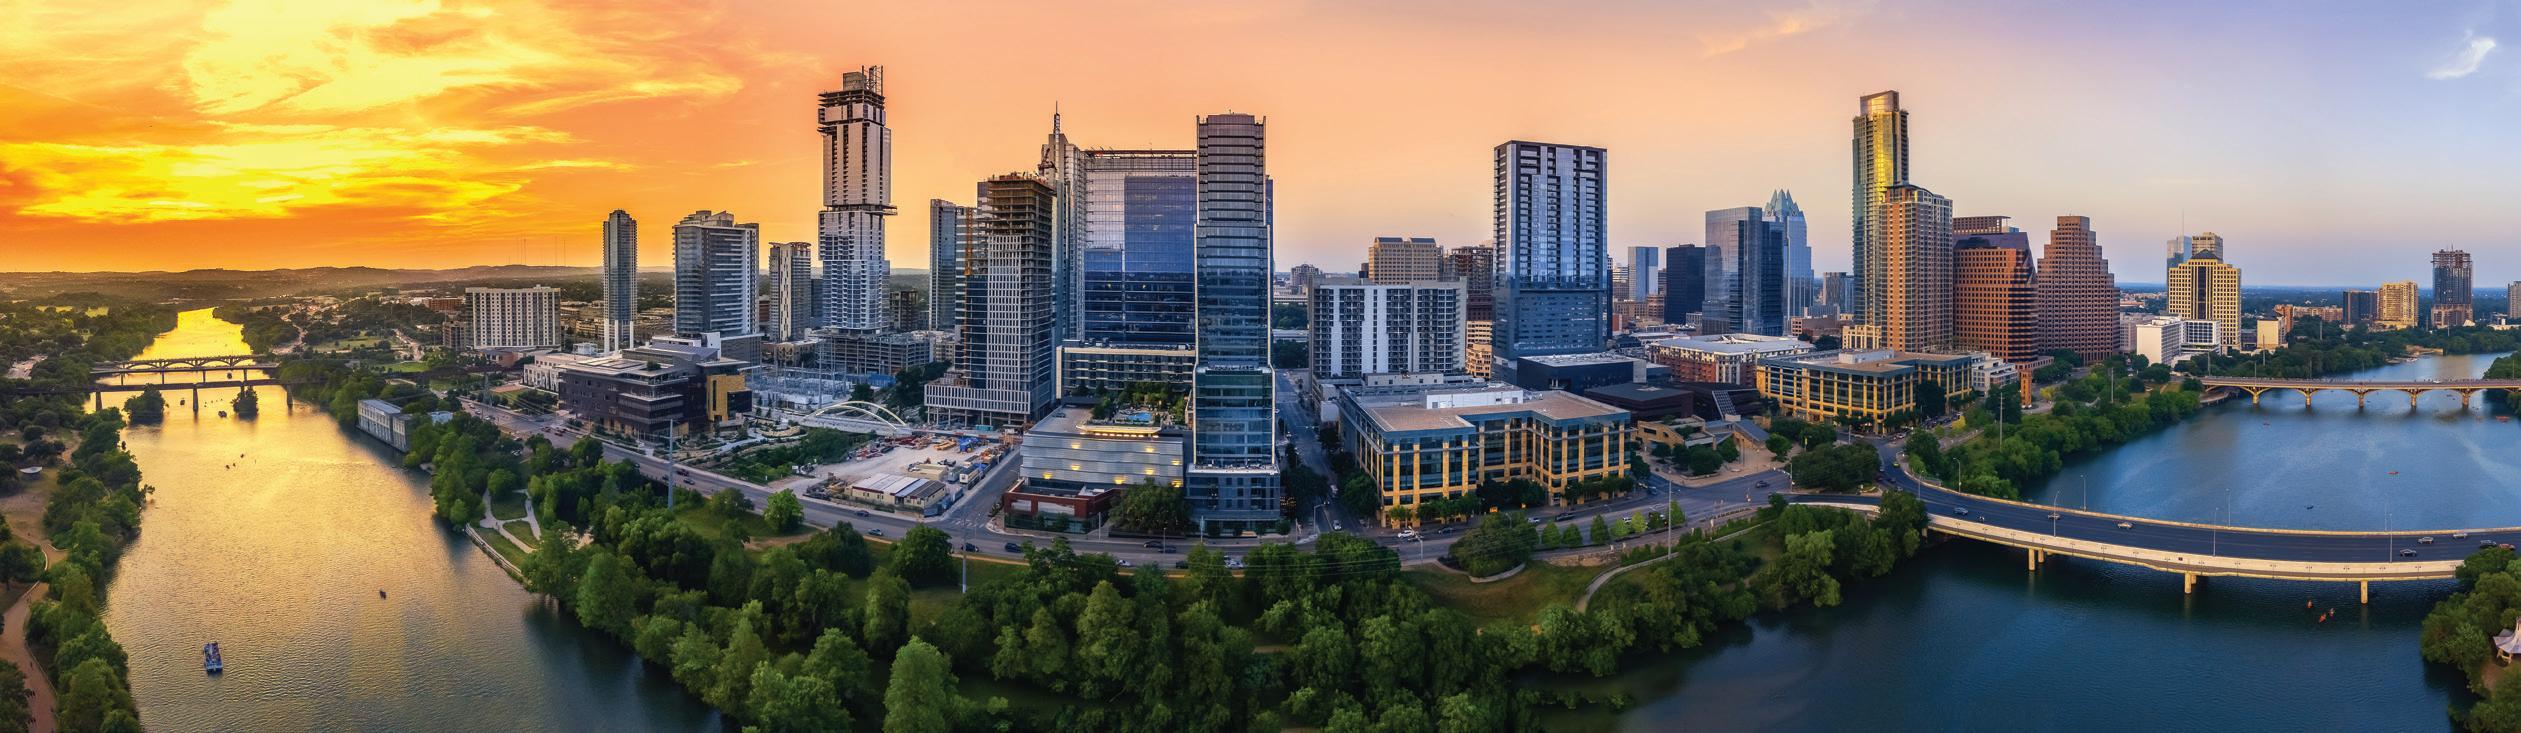 Page 46 of U.S. City Spotlight: Austin